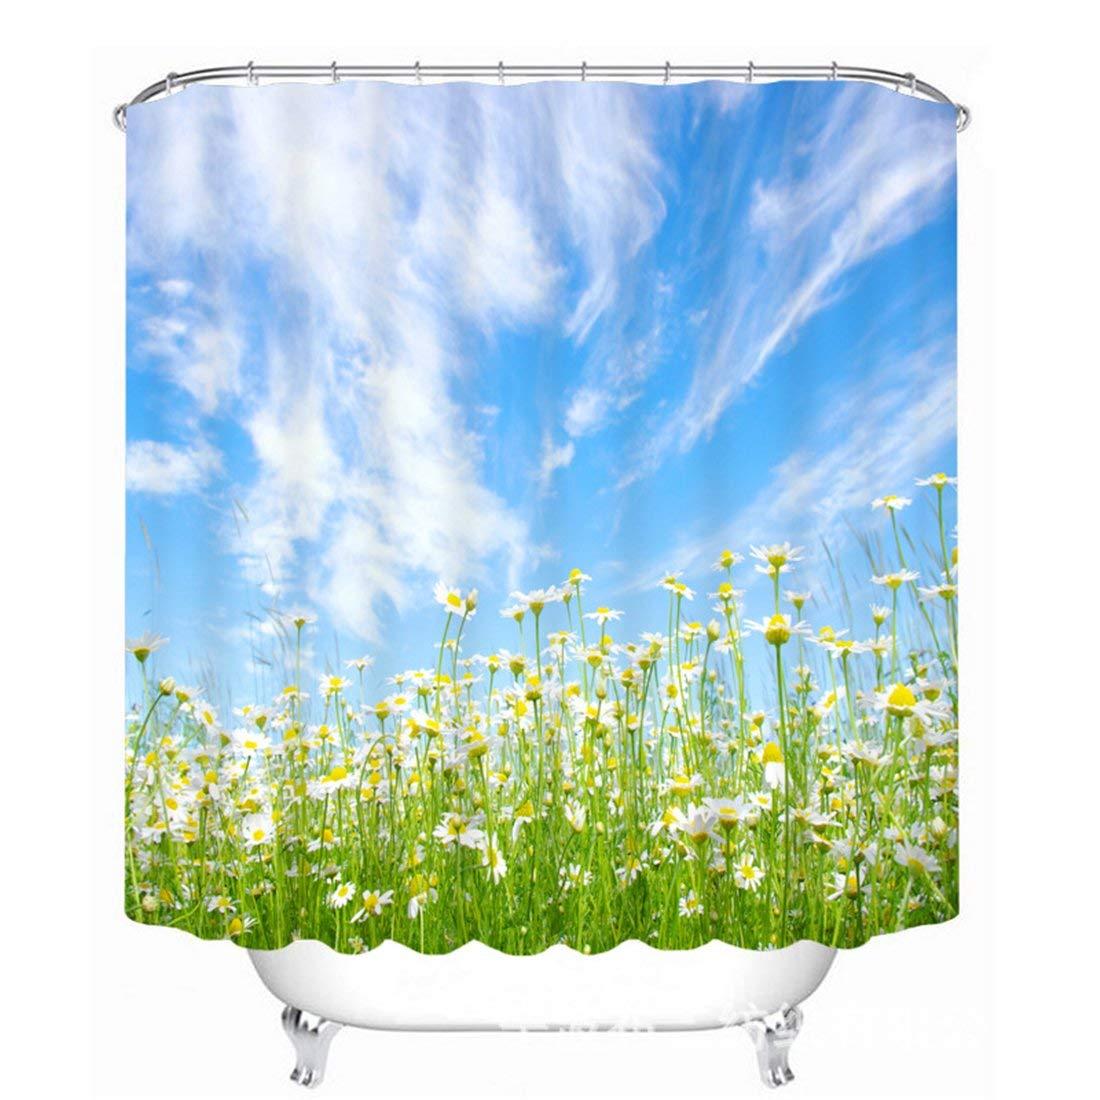 Cheap Blue Cloud Fabric Find Blue Cloud Fabric Deals On